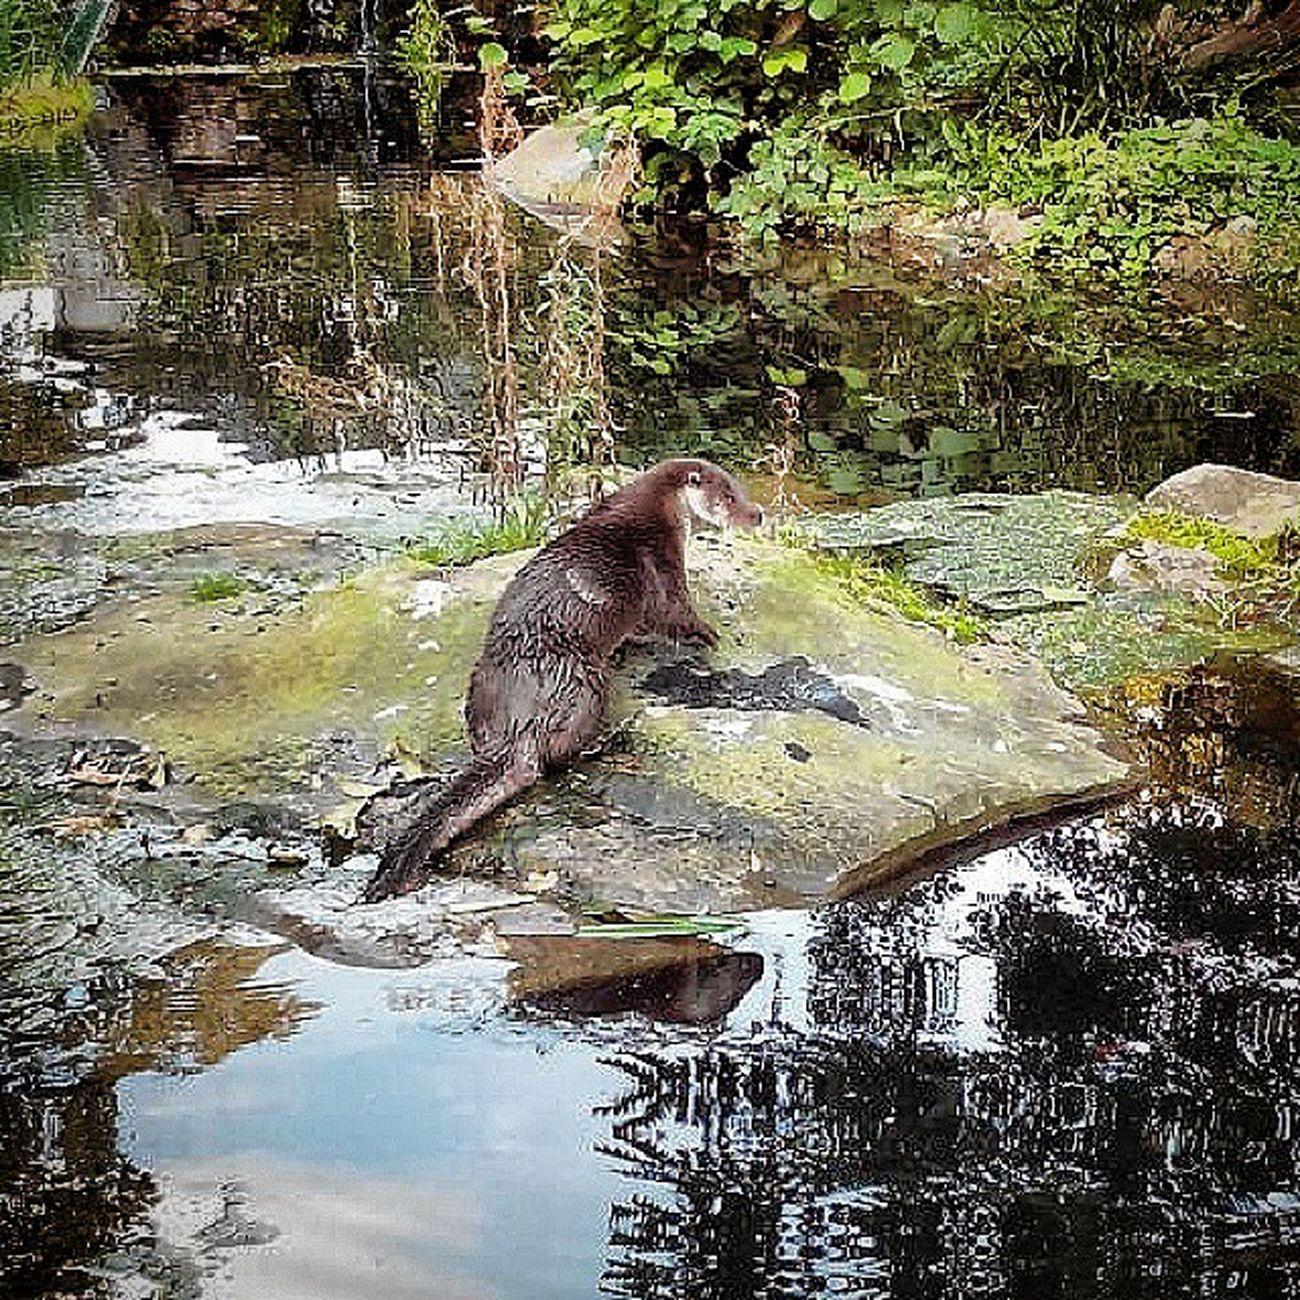 Fischotter KrefelderZoo oder Zoo Krefeld